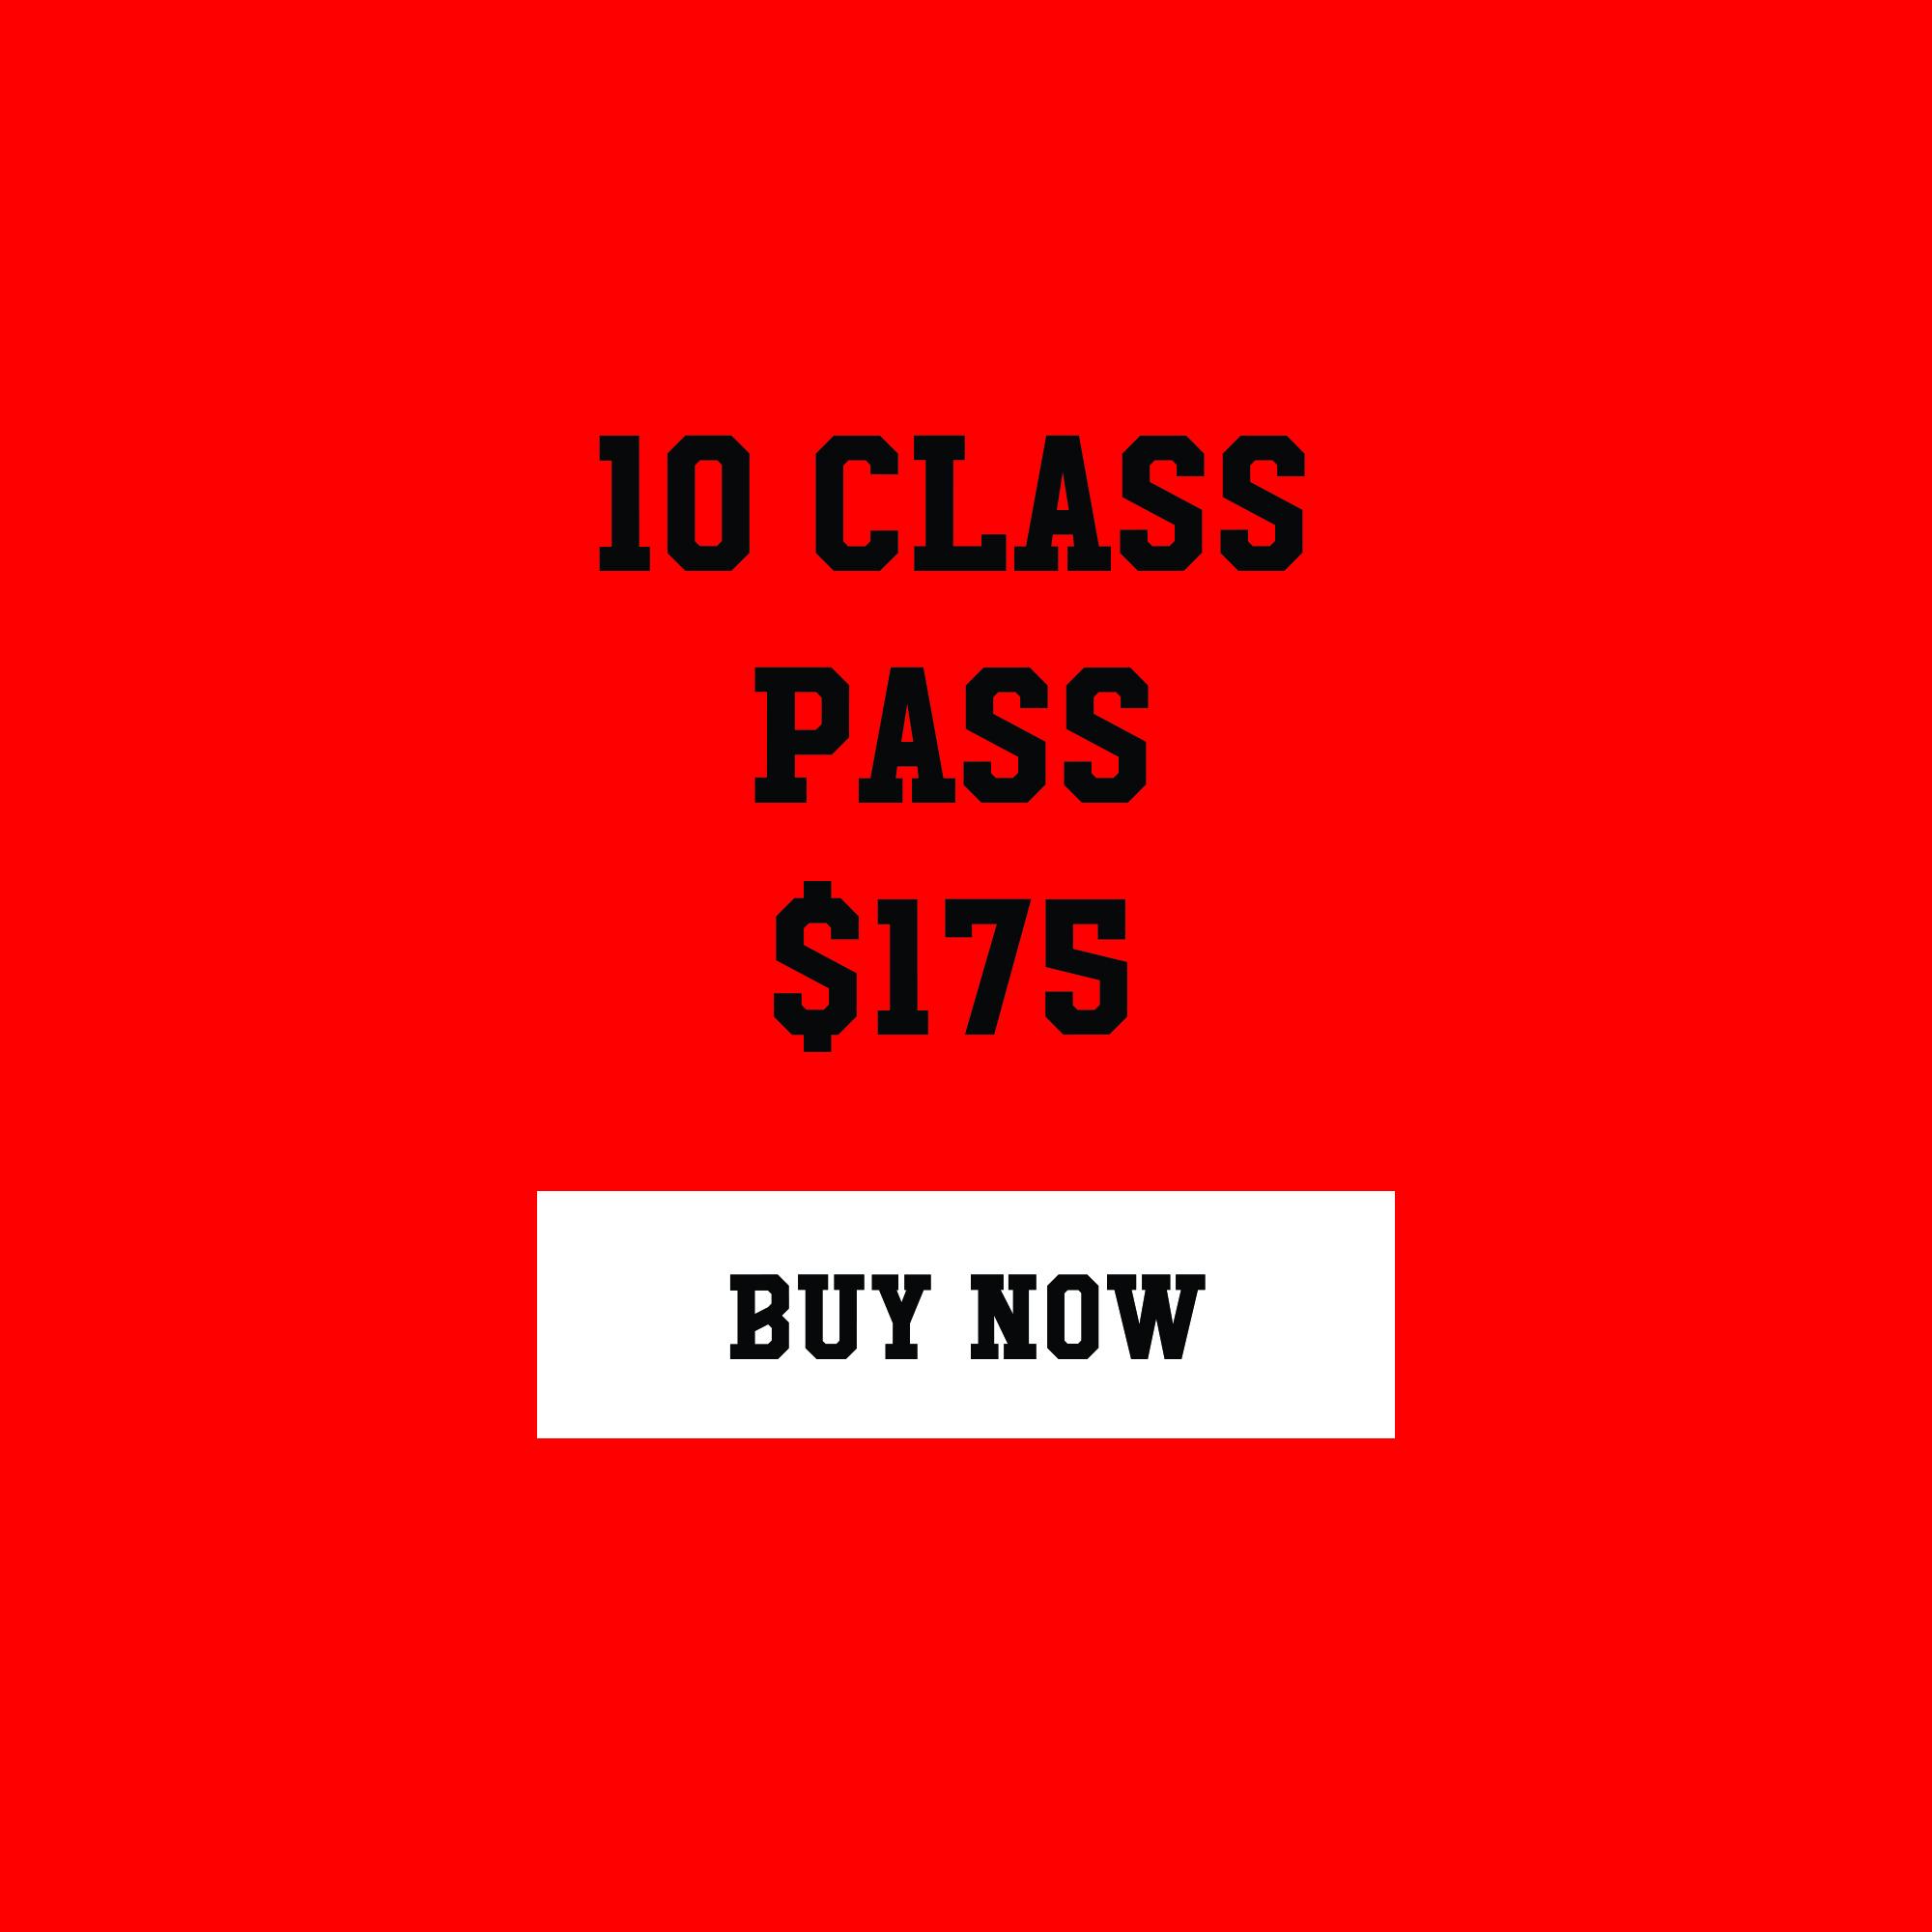 ($17.5 a class) Expires in twelve months